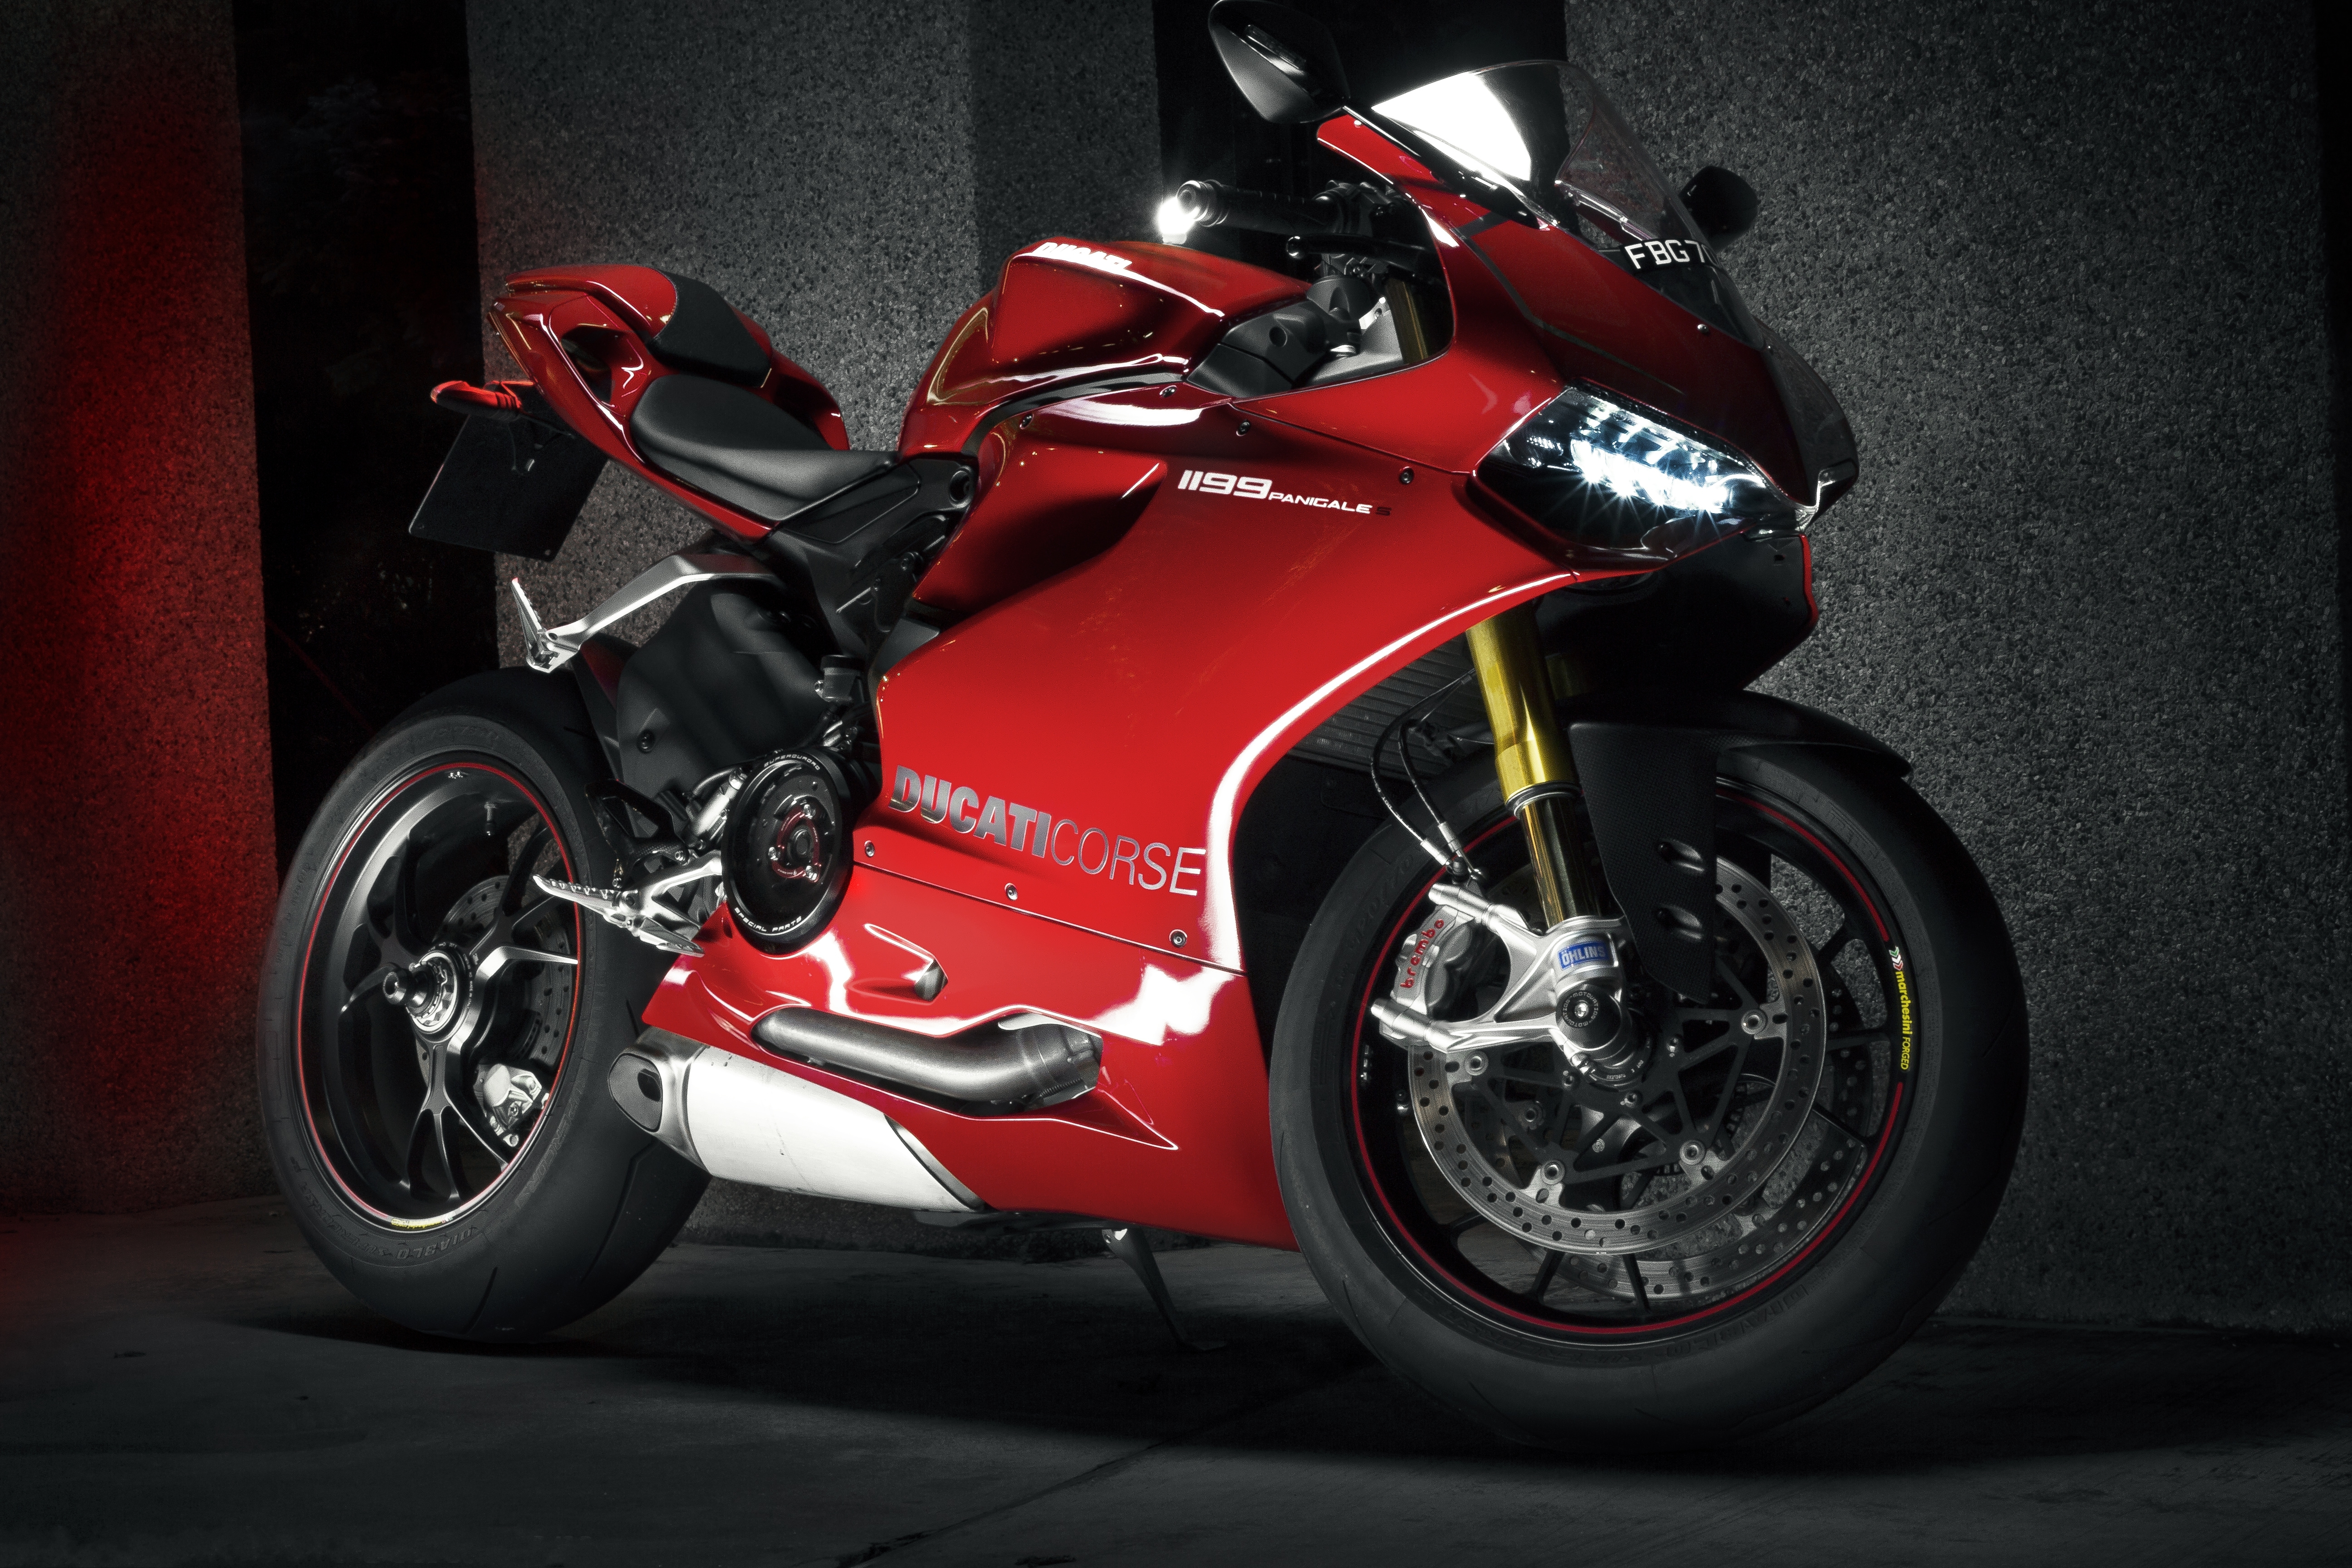 70487 скачать обои Мотоциклы, Дукати (Ducati), 1199, Ducati 1199 Panigale, Мотоцикл, Красный - заставки и картинки бесплатно